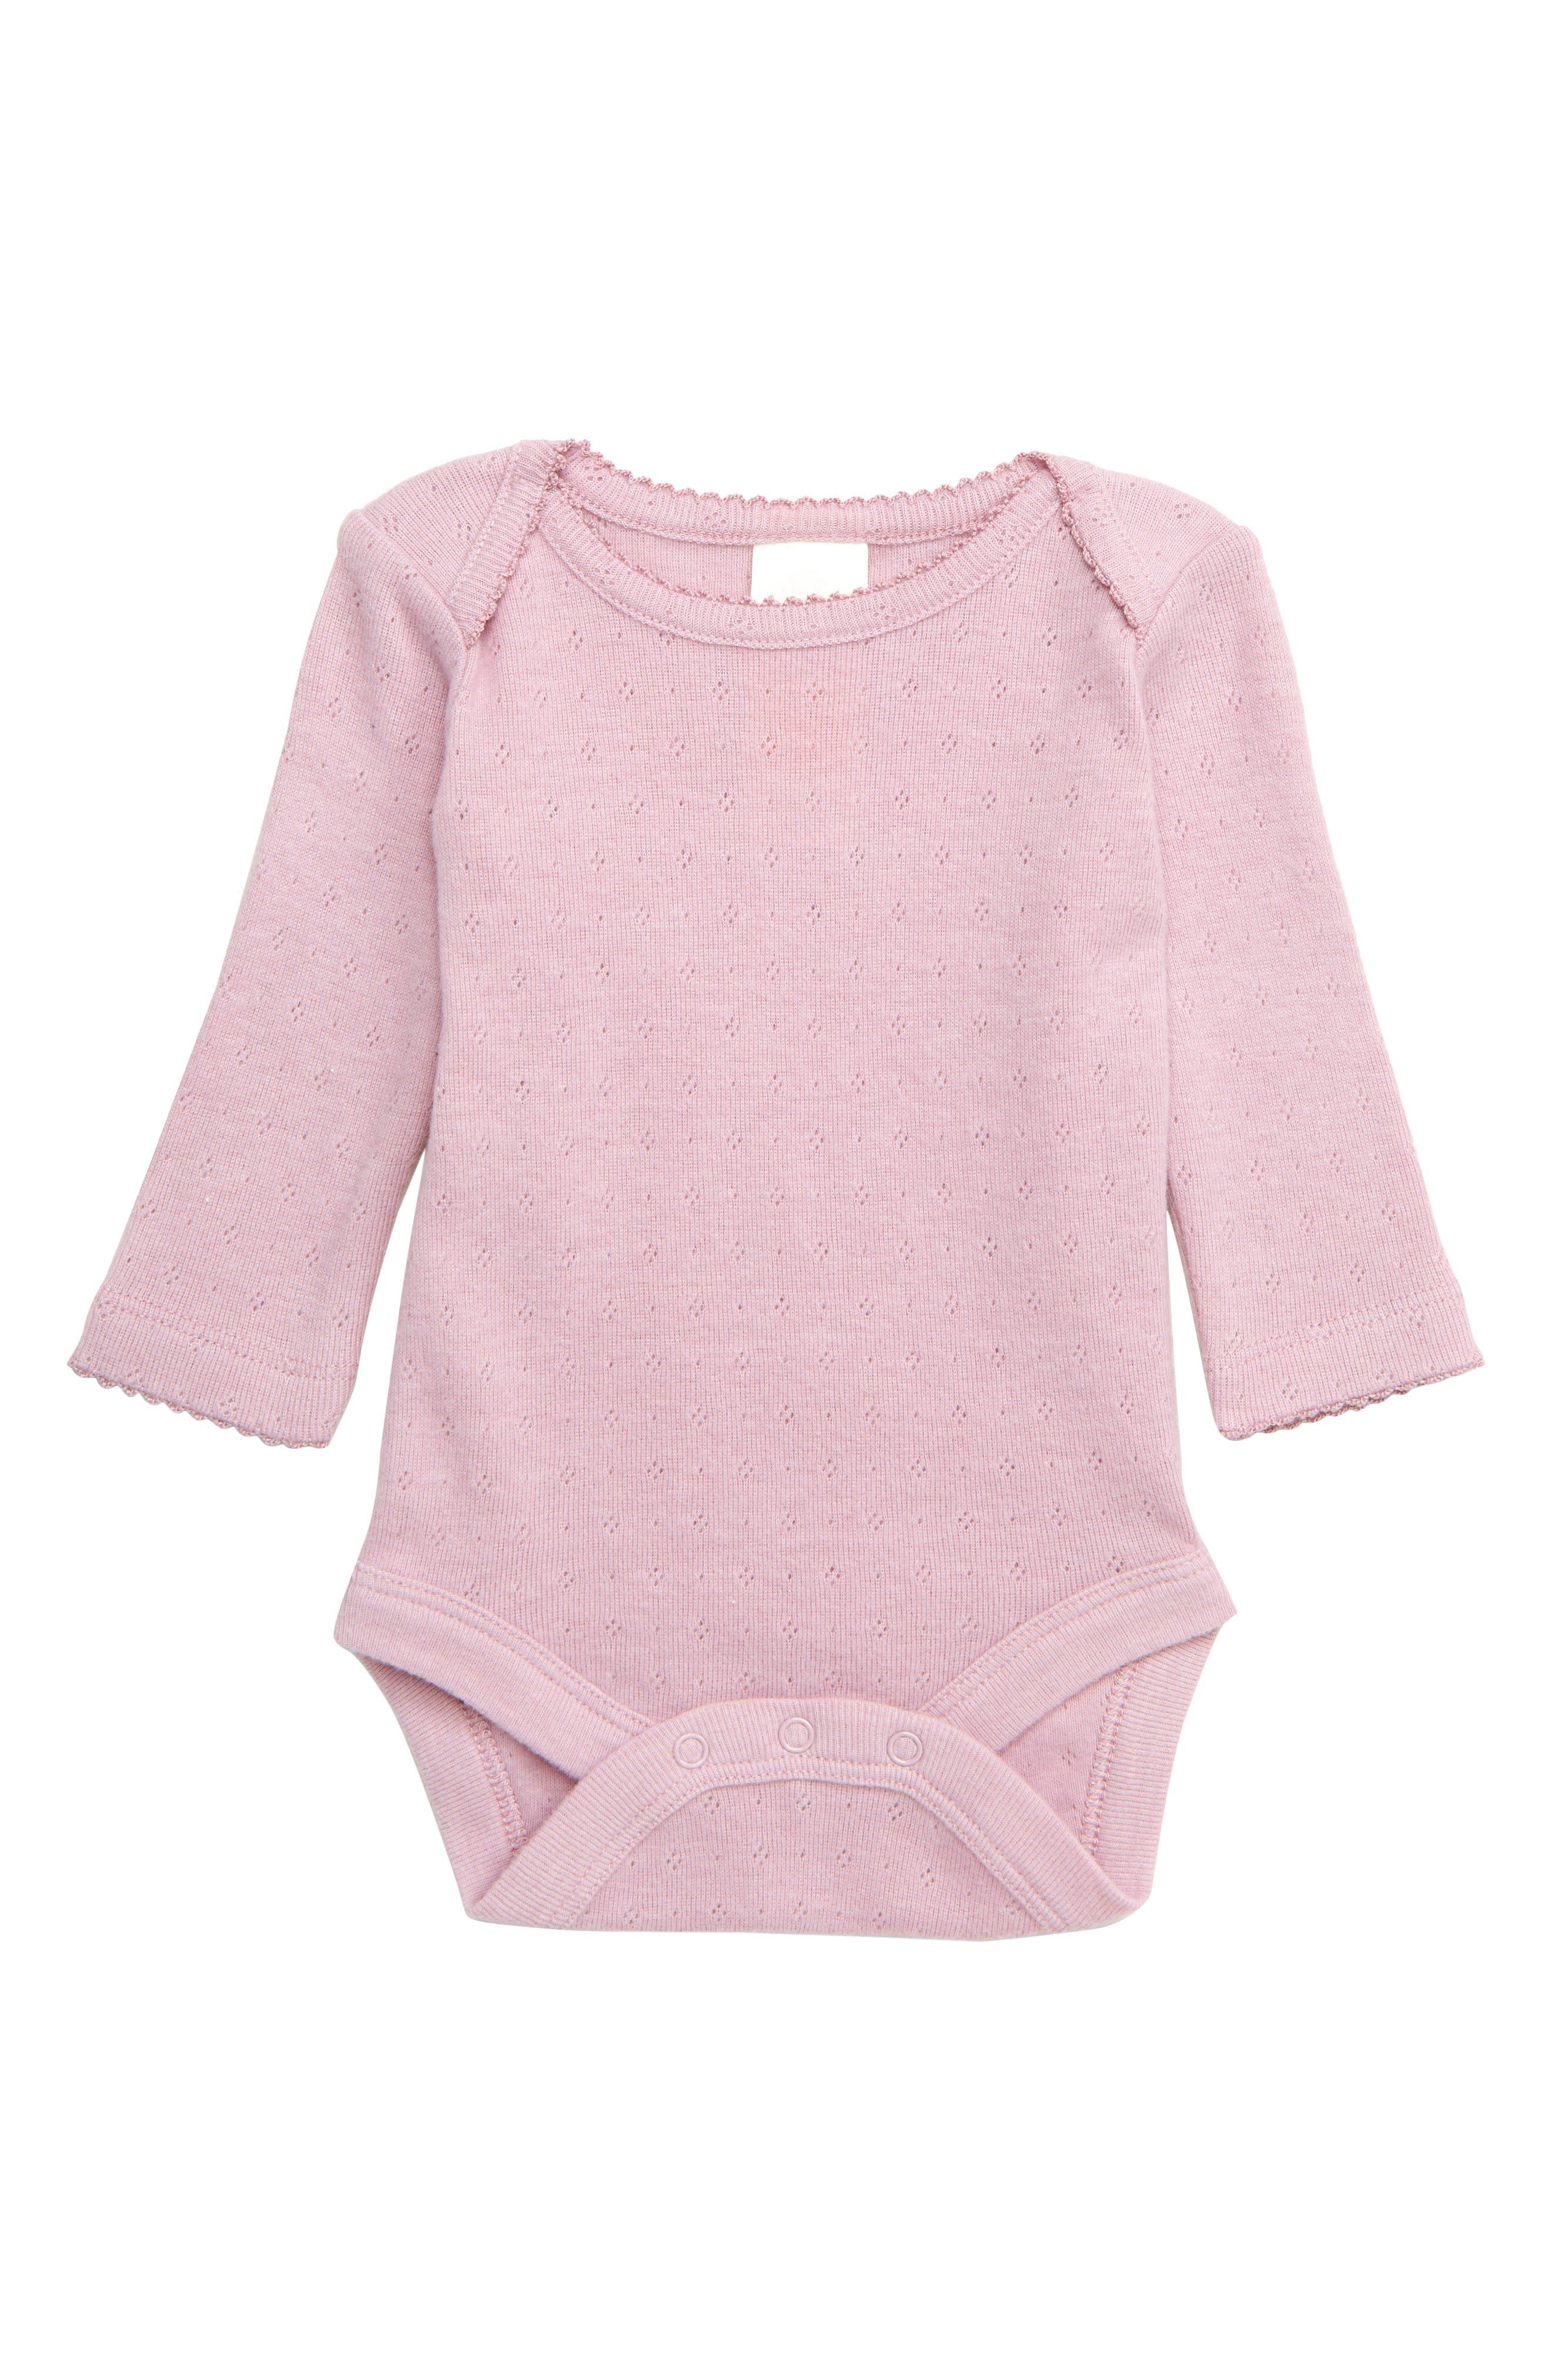 Toddler Girls Mini Boden Supersoft Pointelle Bodysuit Size 23Y  Purple